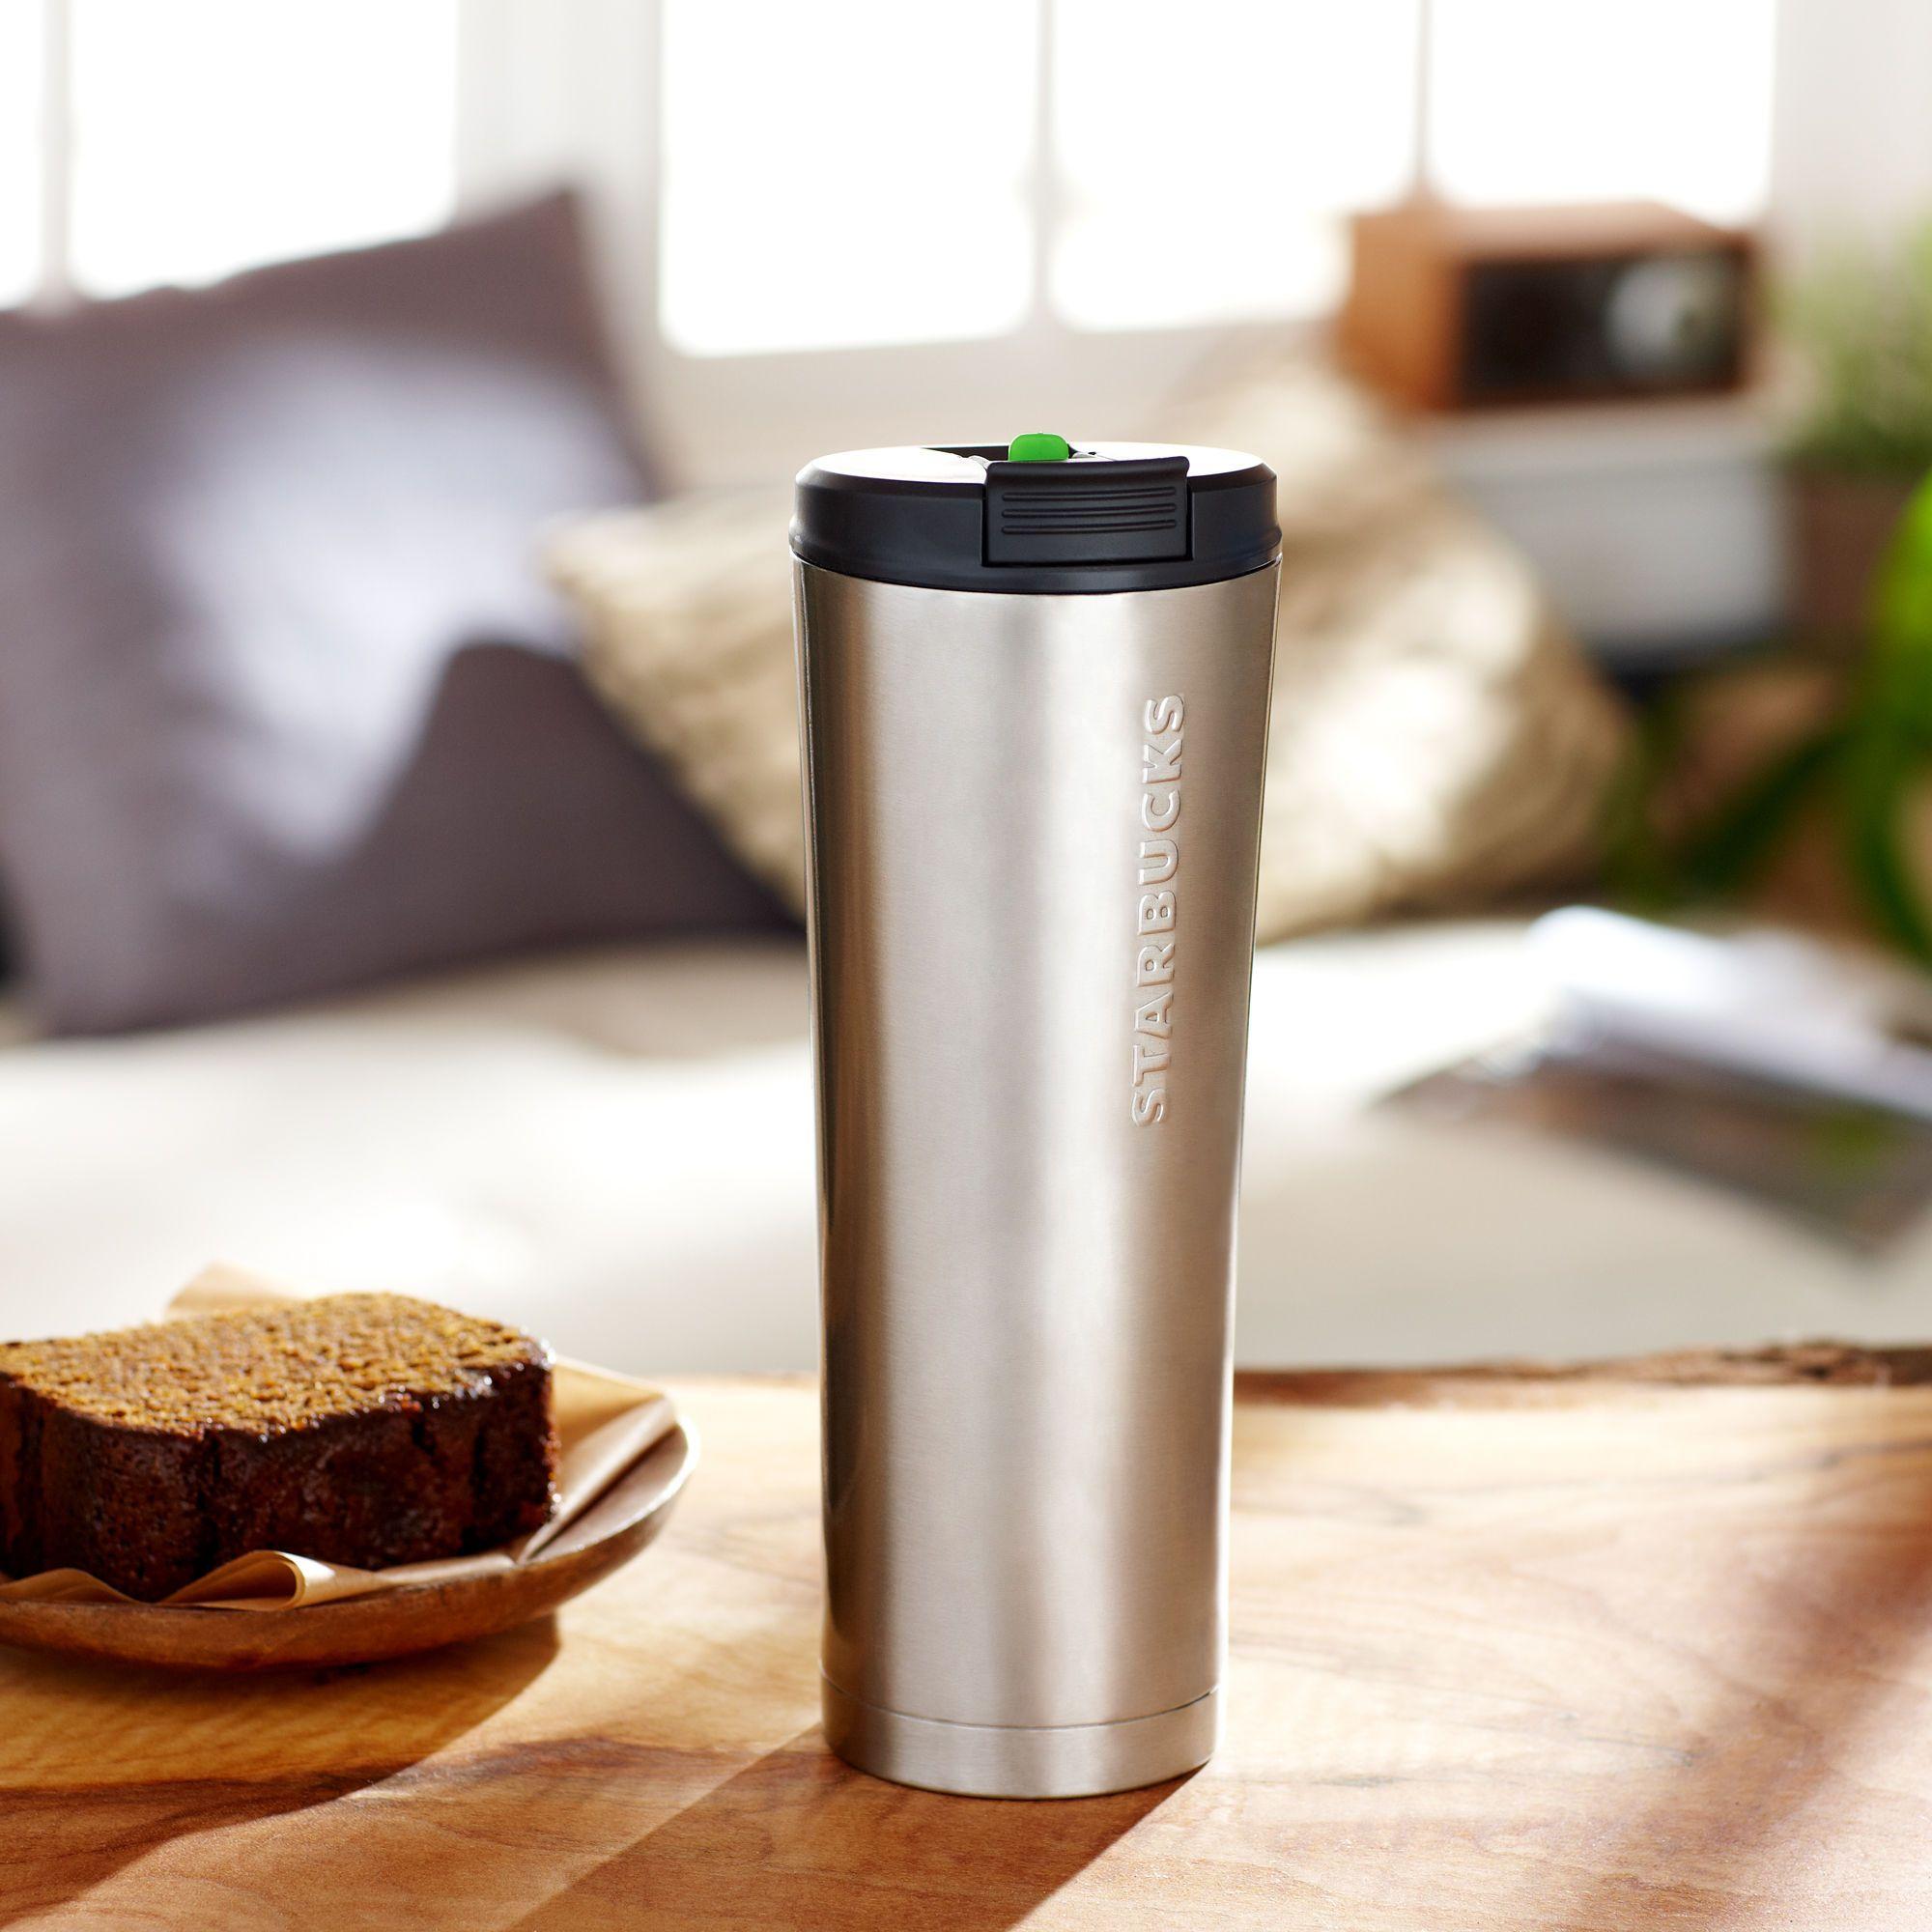 Starbucks® Stainless Steel Sipping Tumbler, 20 fl oz